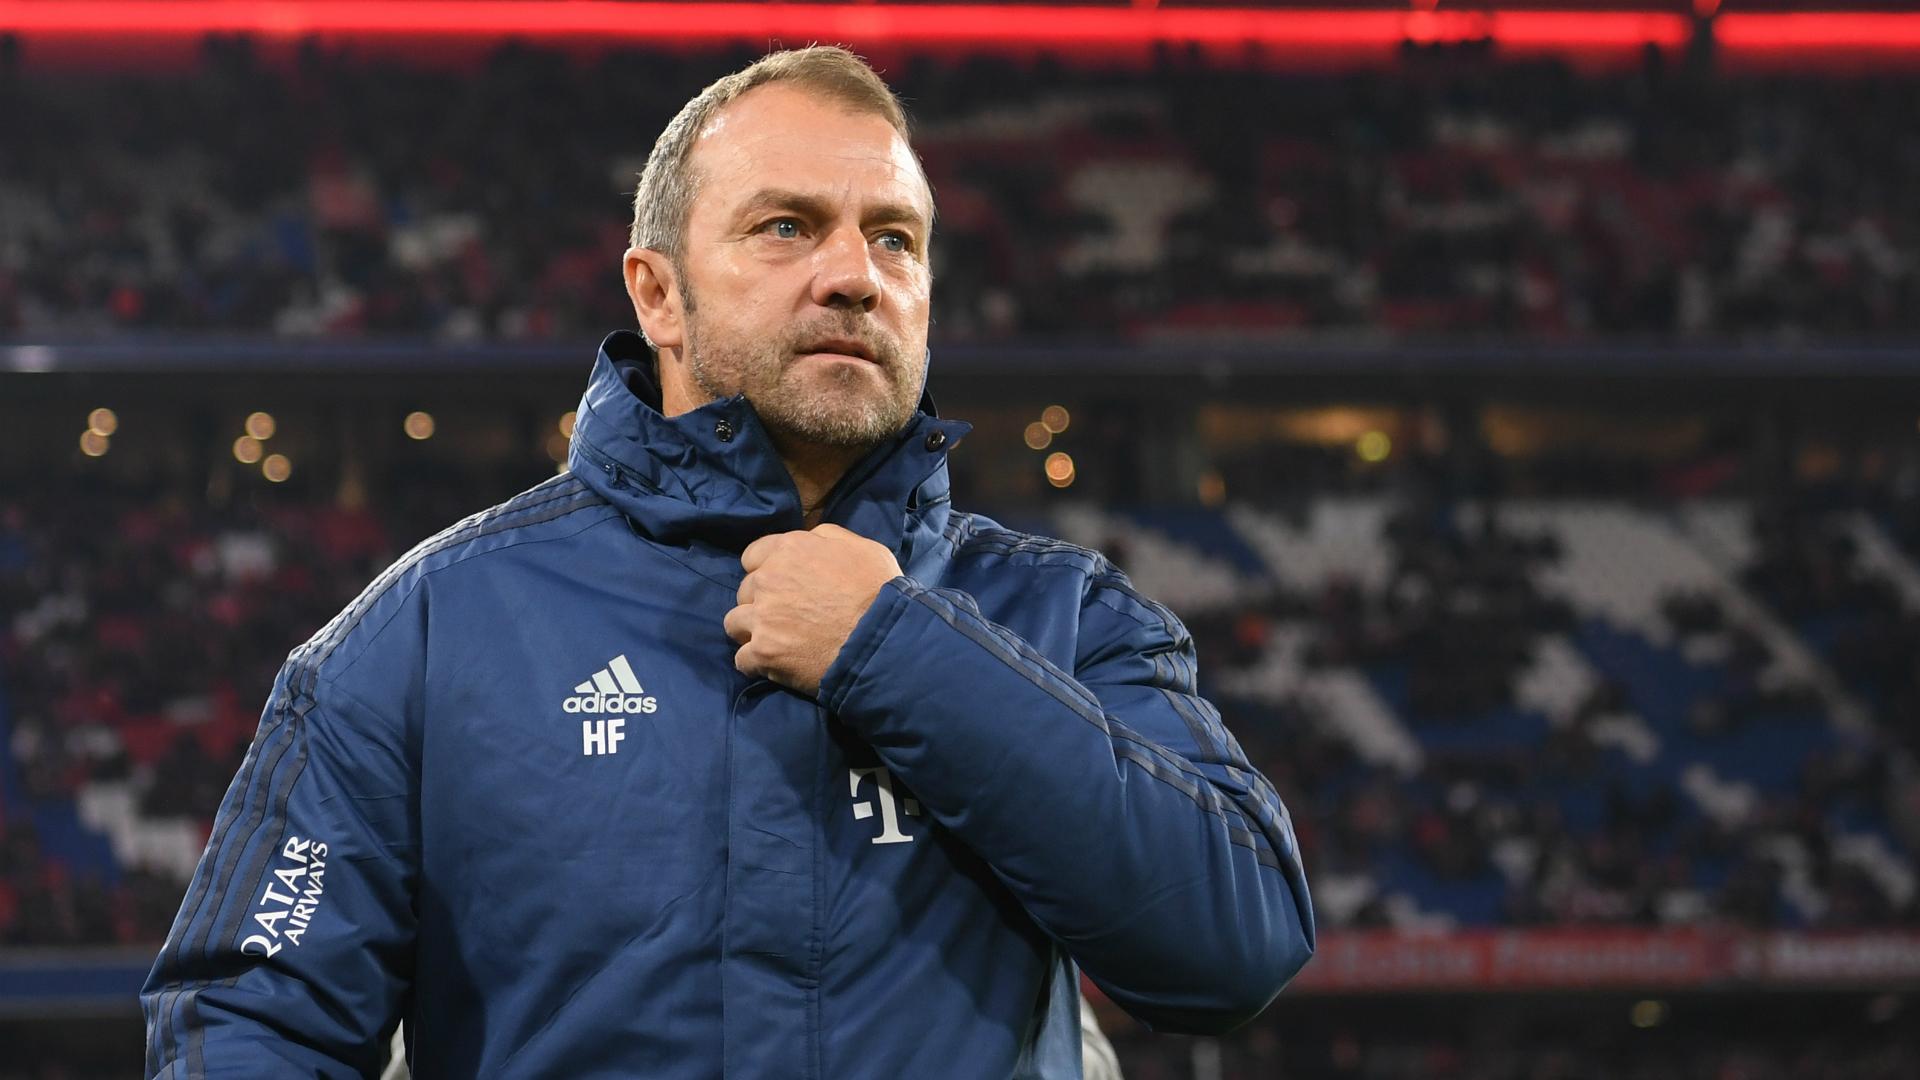 Flick aware slip up against Tottenham will dash hopes of keeping Bayern Munich job